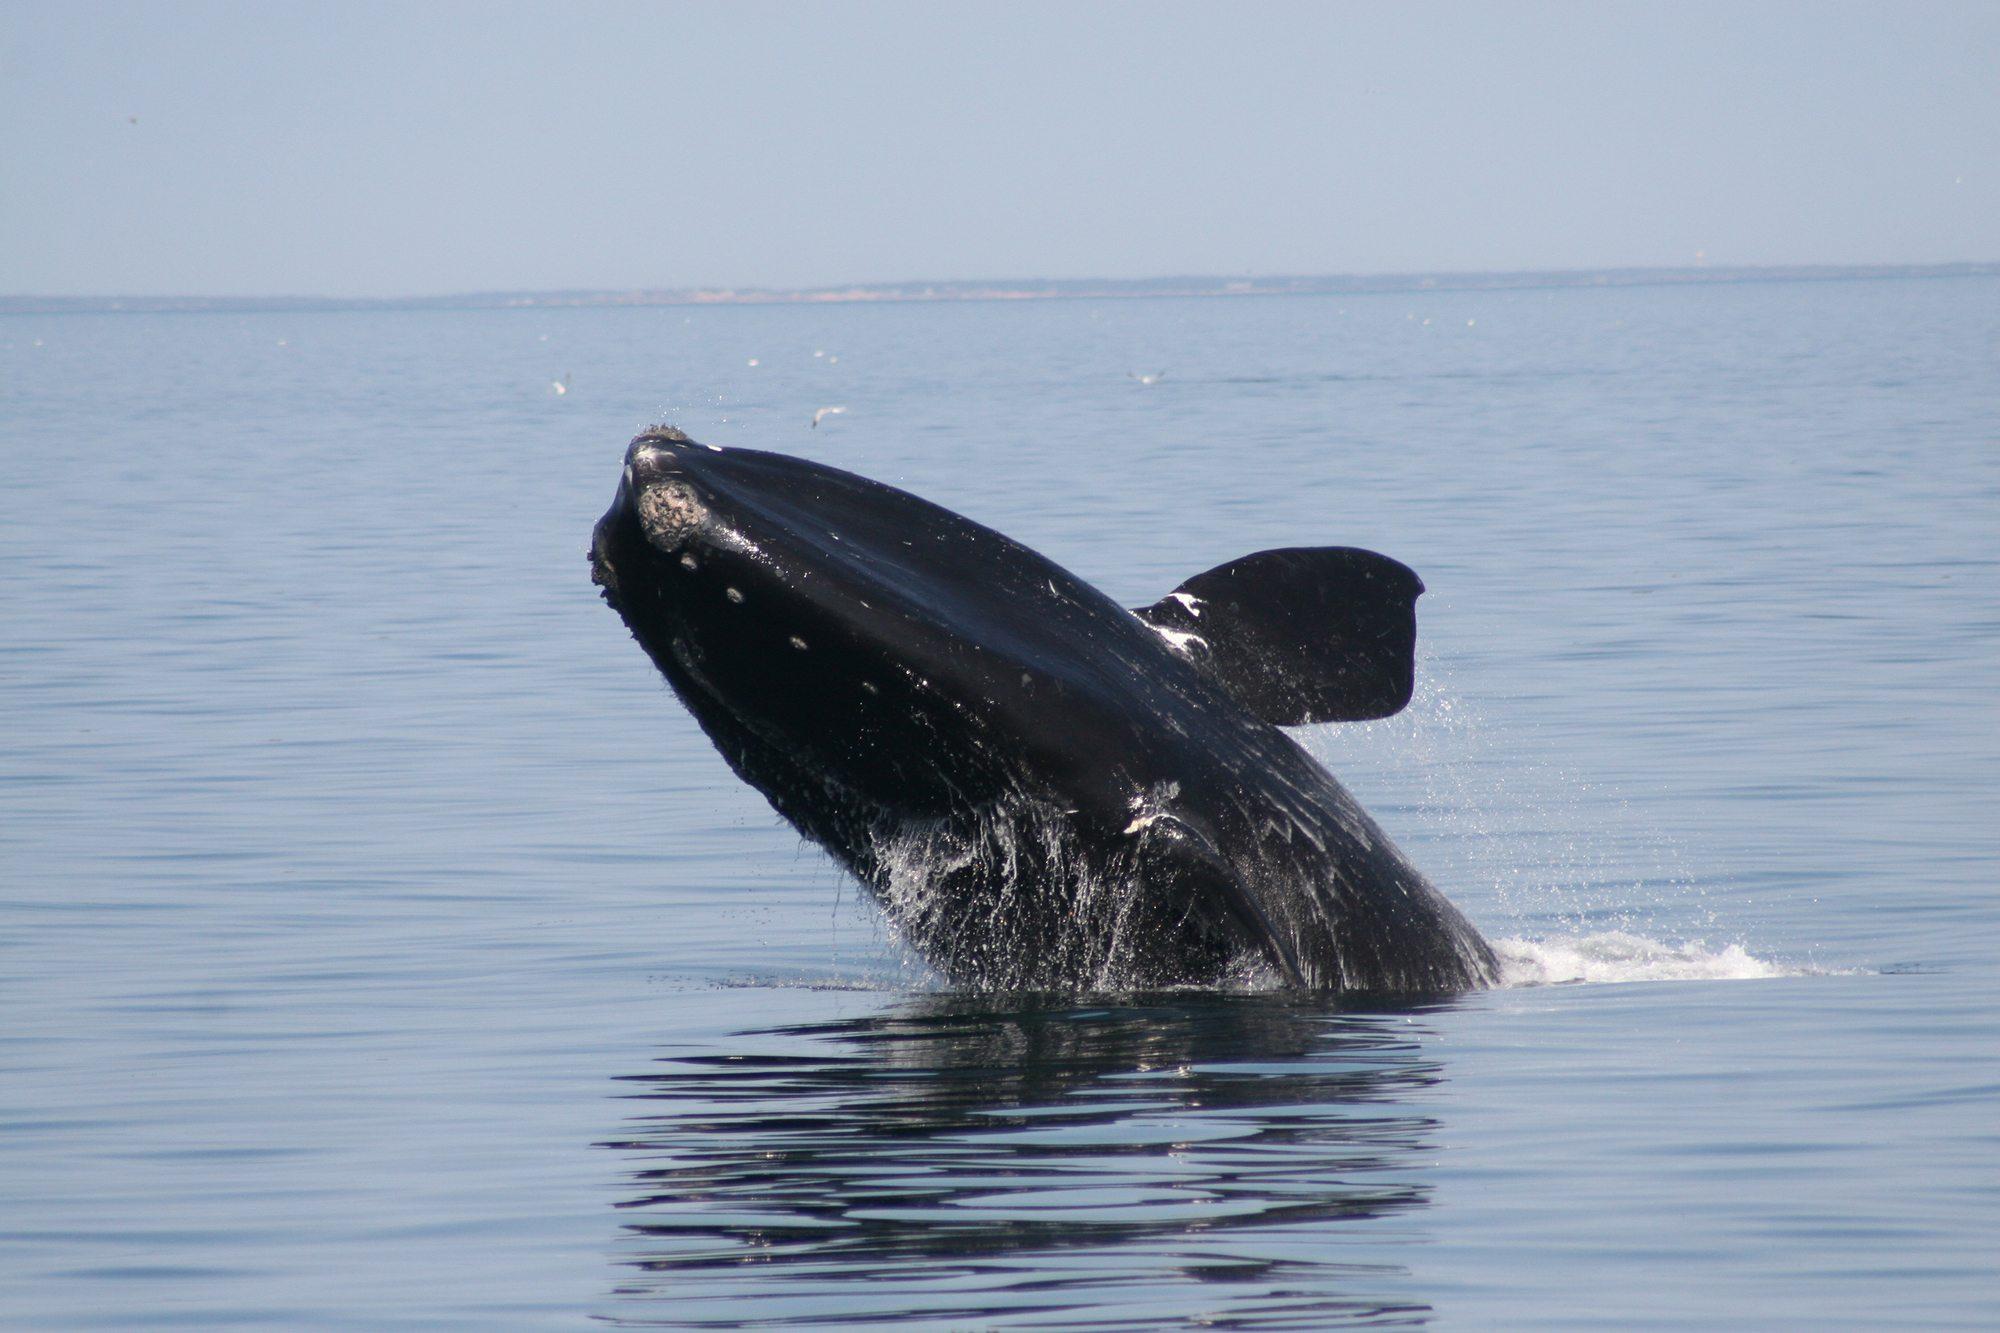 Der Atlantische Nordkaper ist vom Aussterben bedroht. (C) WDC